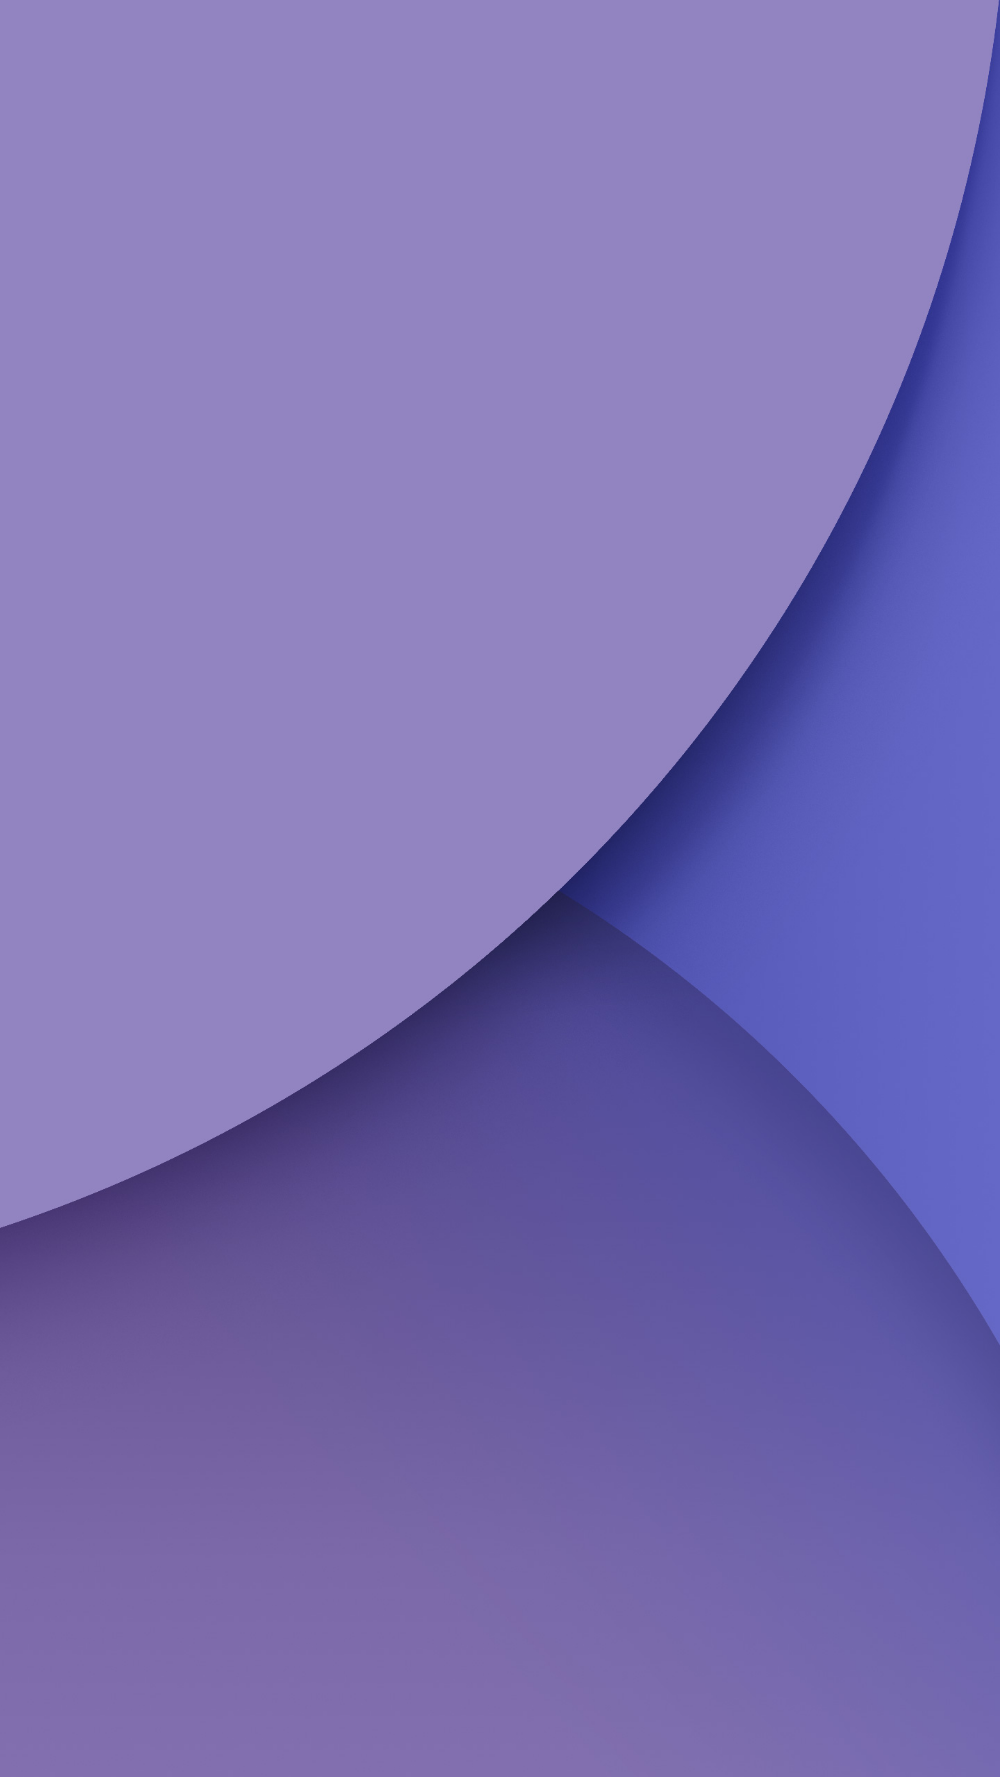 2K Mobile Wallpaper Background Wallpaper Background